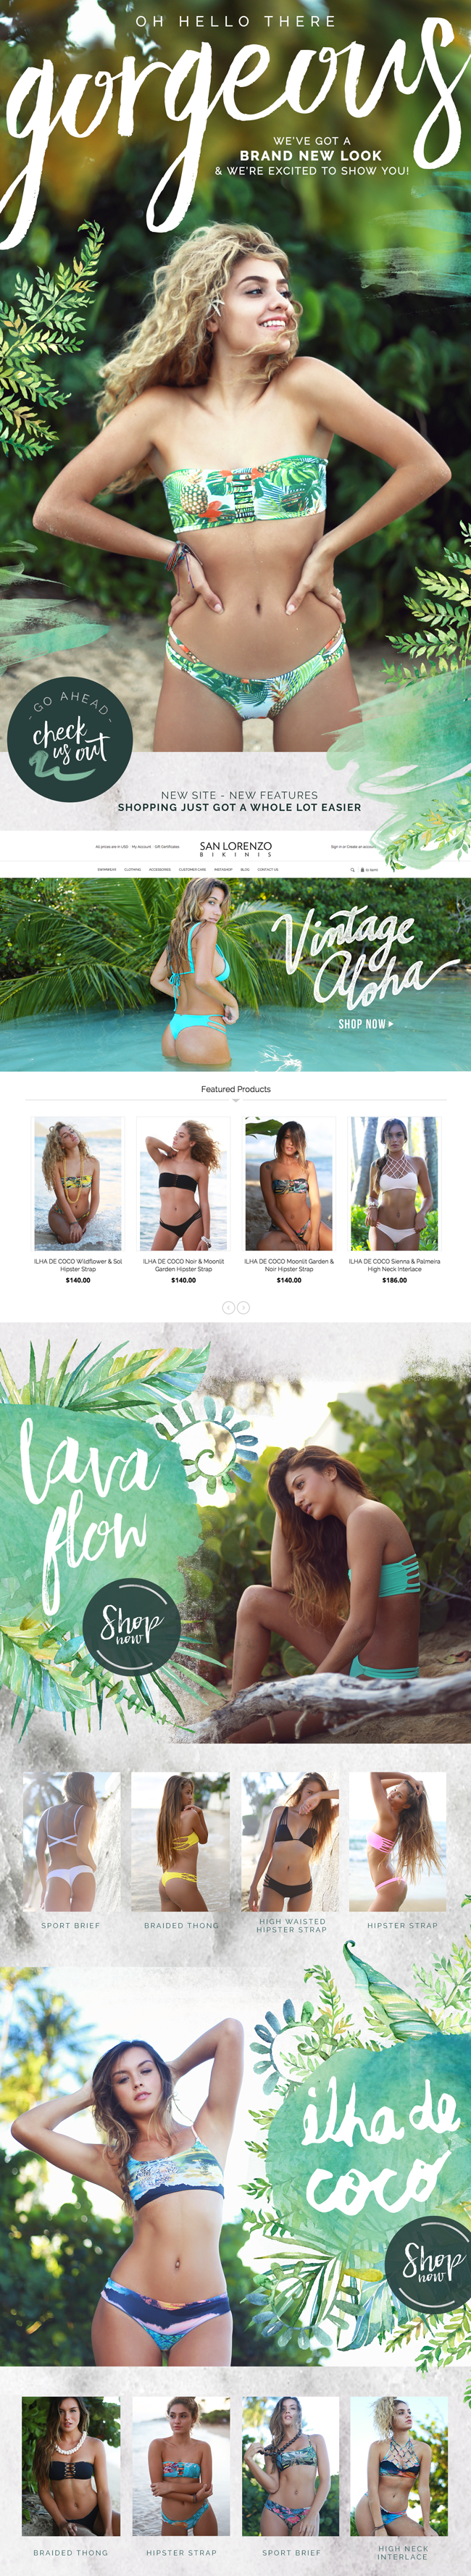 new-websitelaunch-sanlorenzo.png